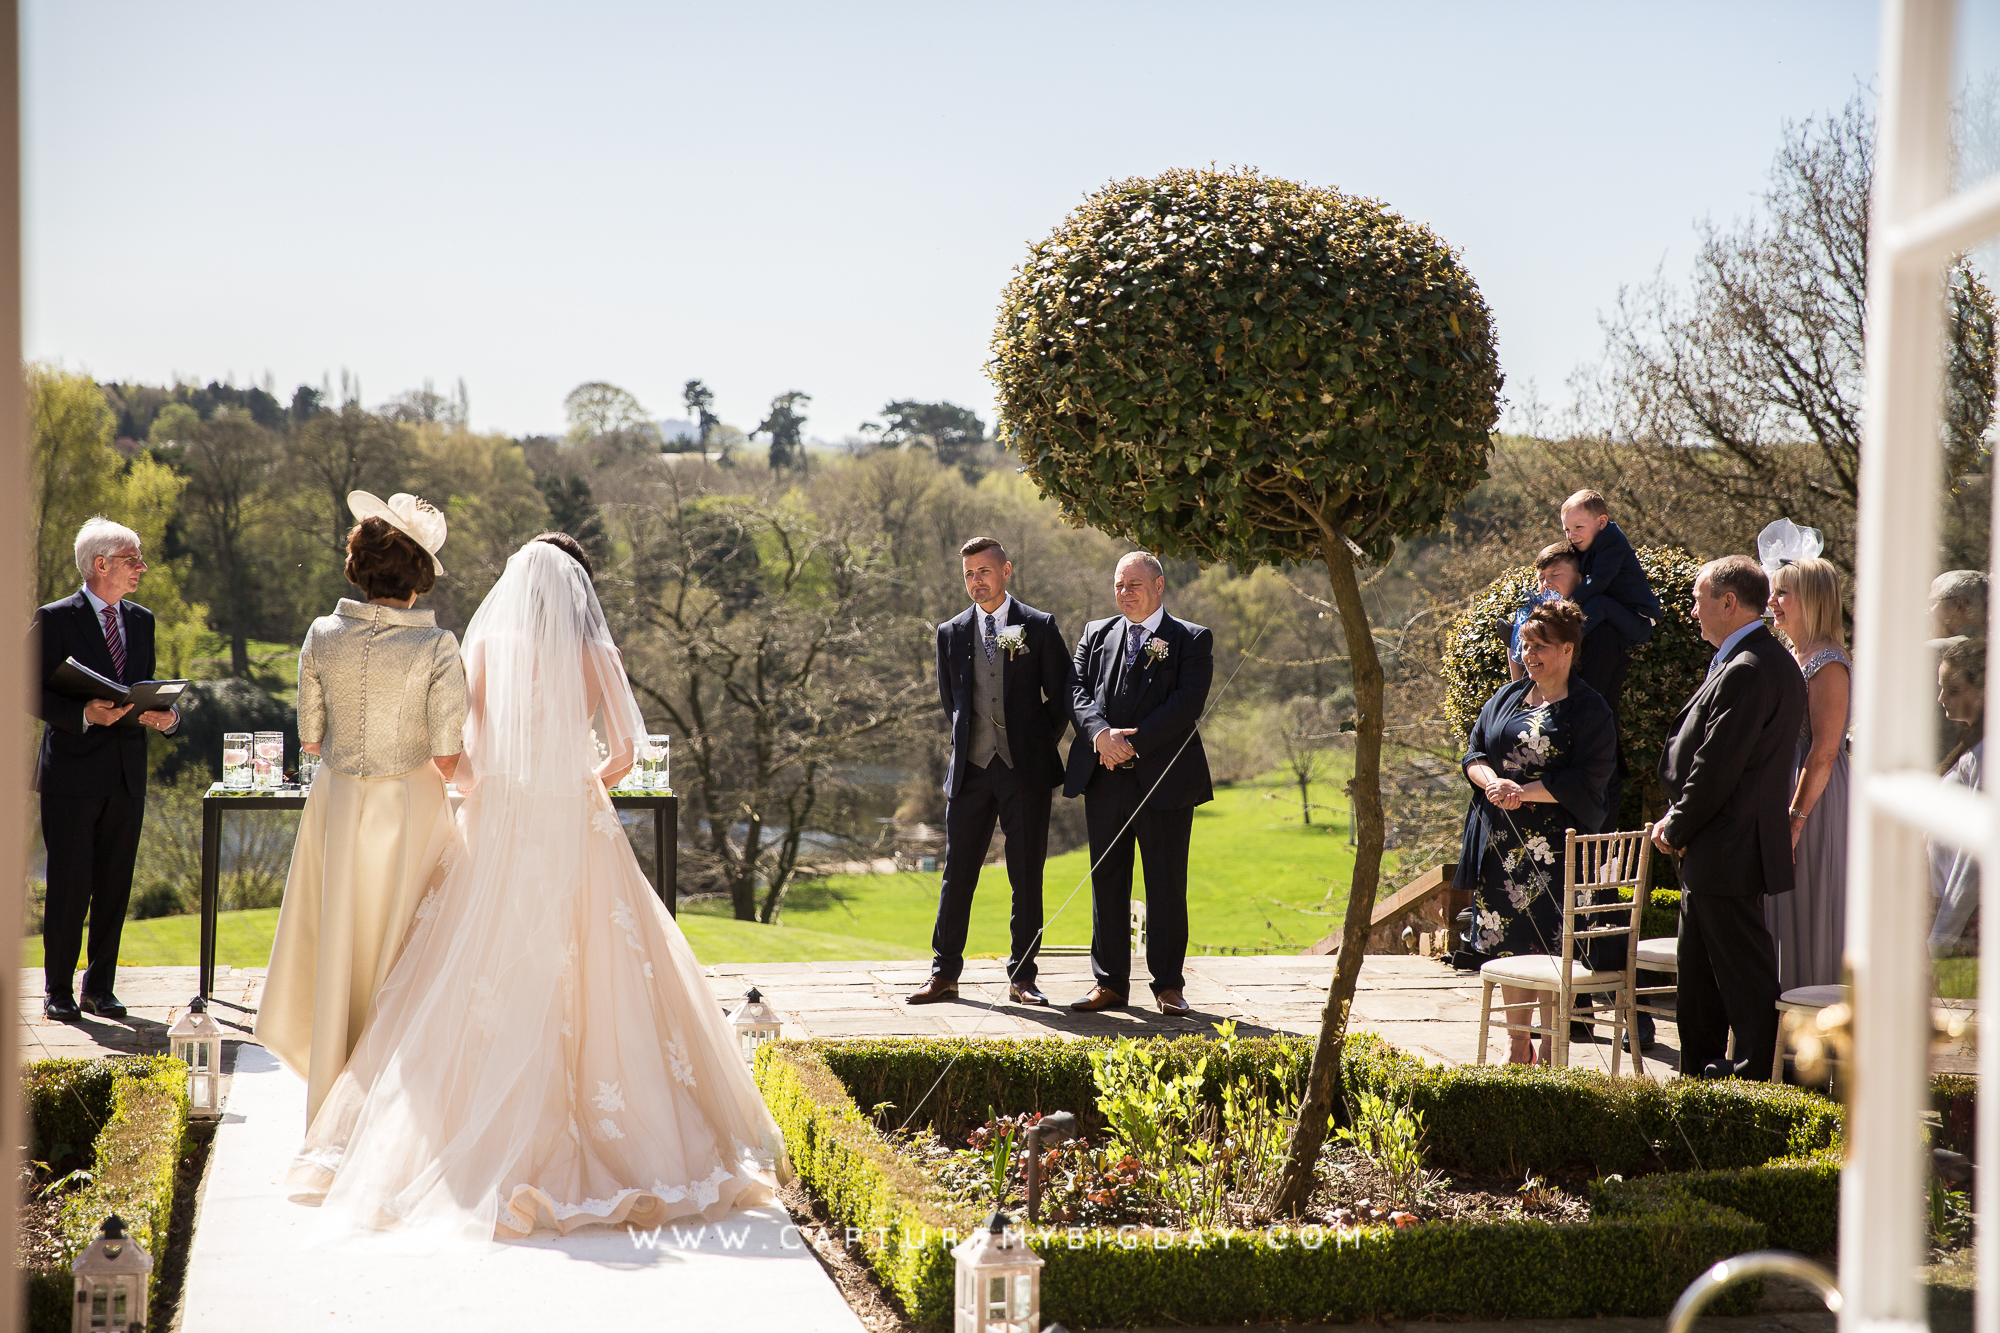 groom watching the bride walking down the aisle